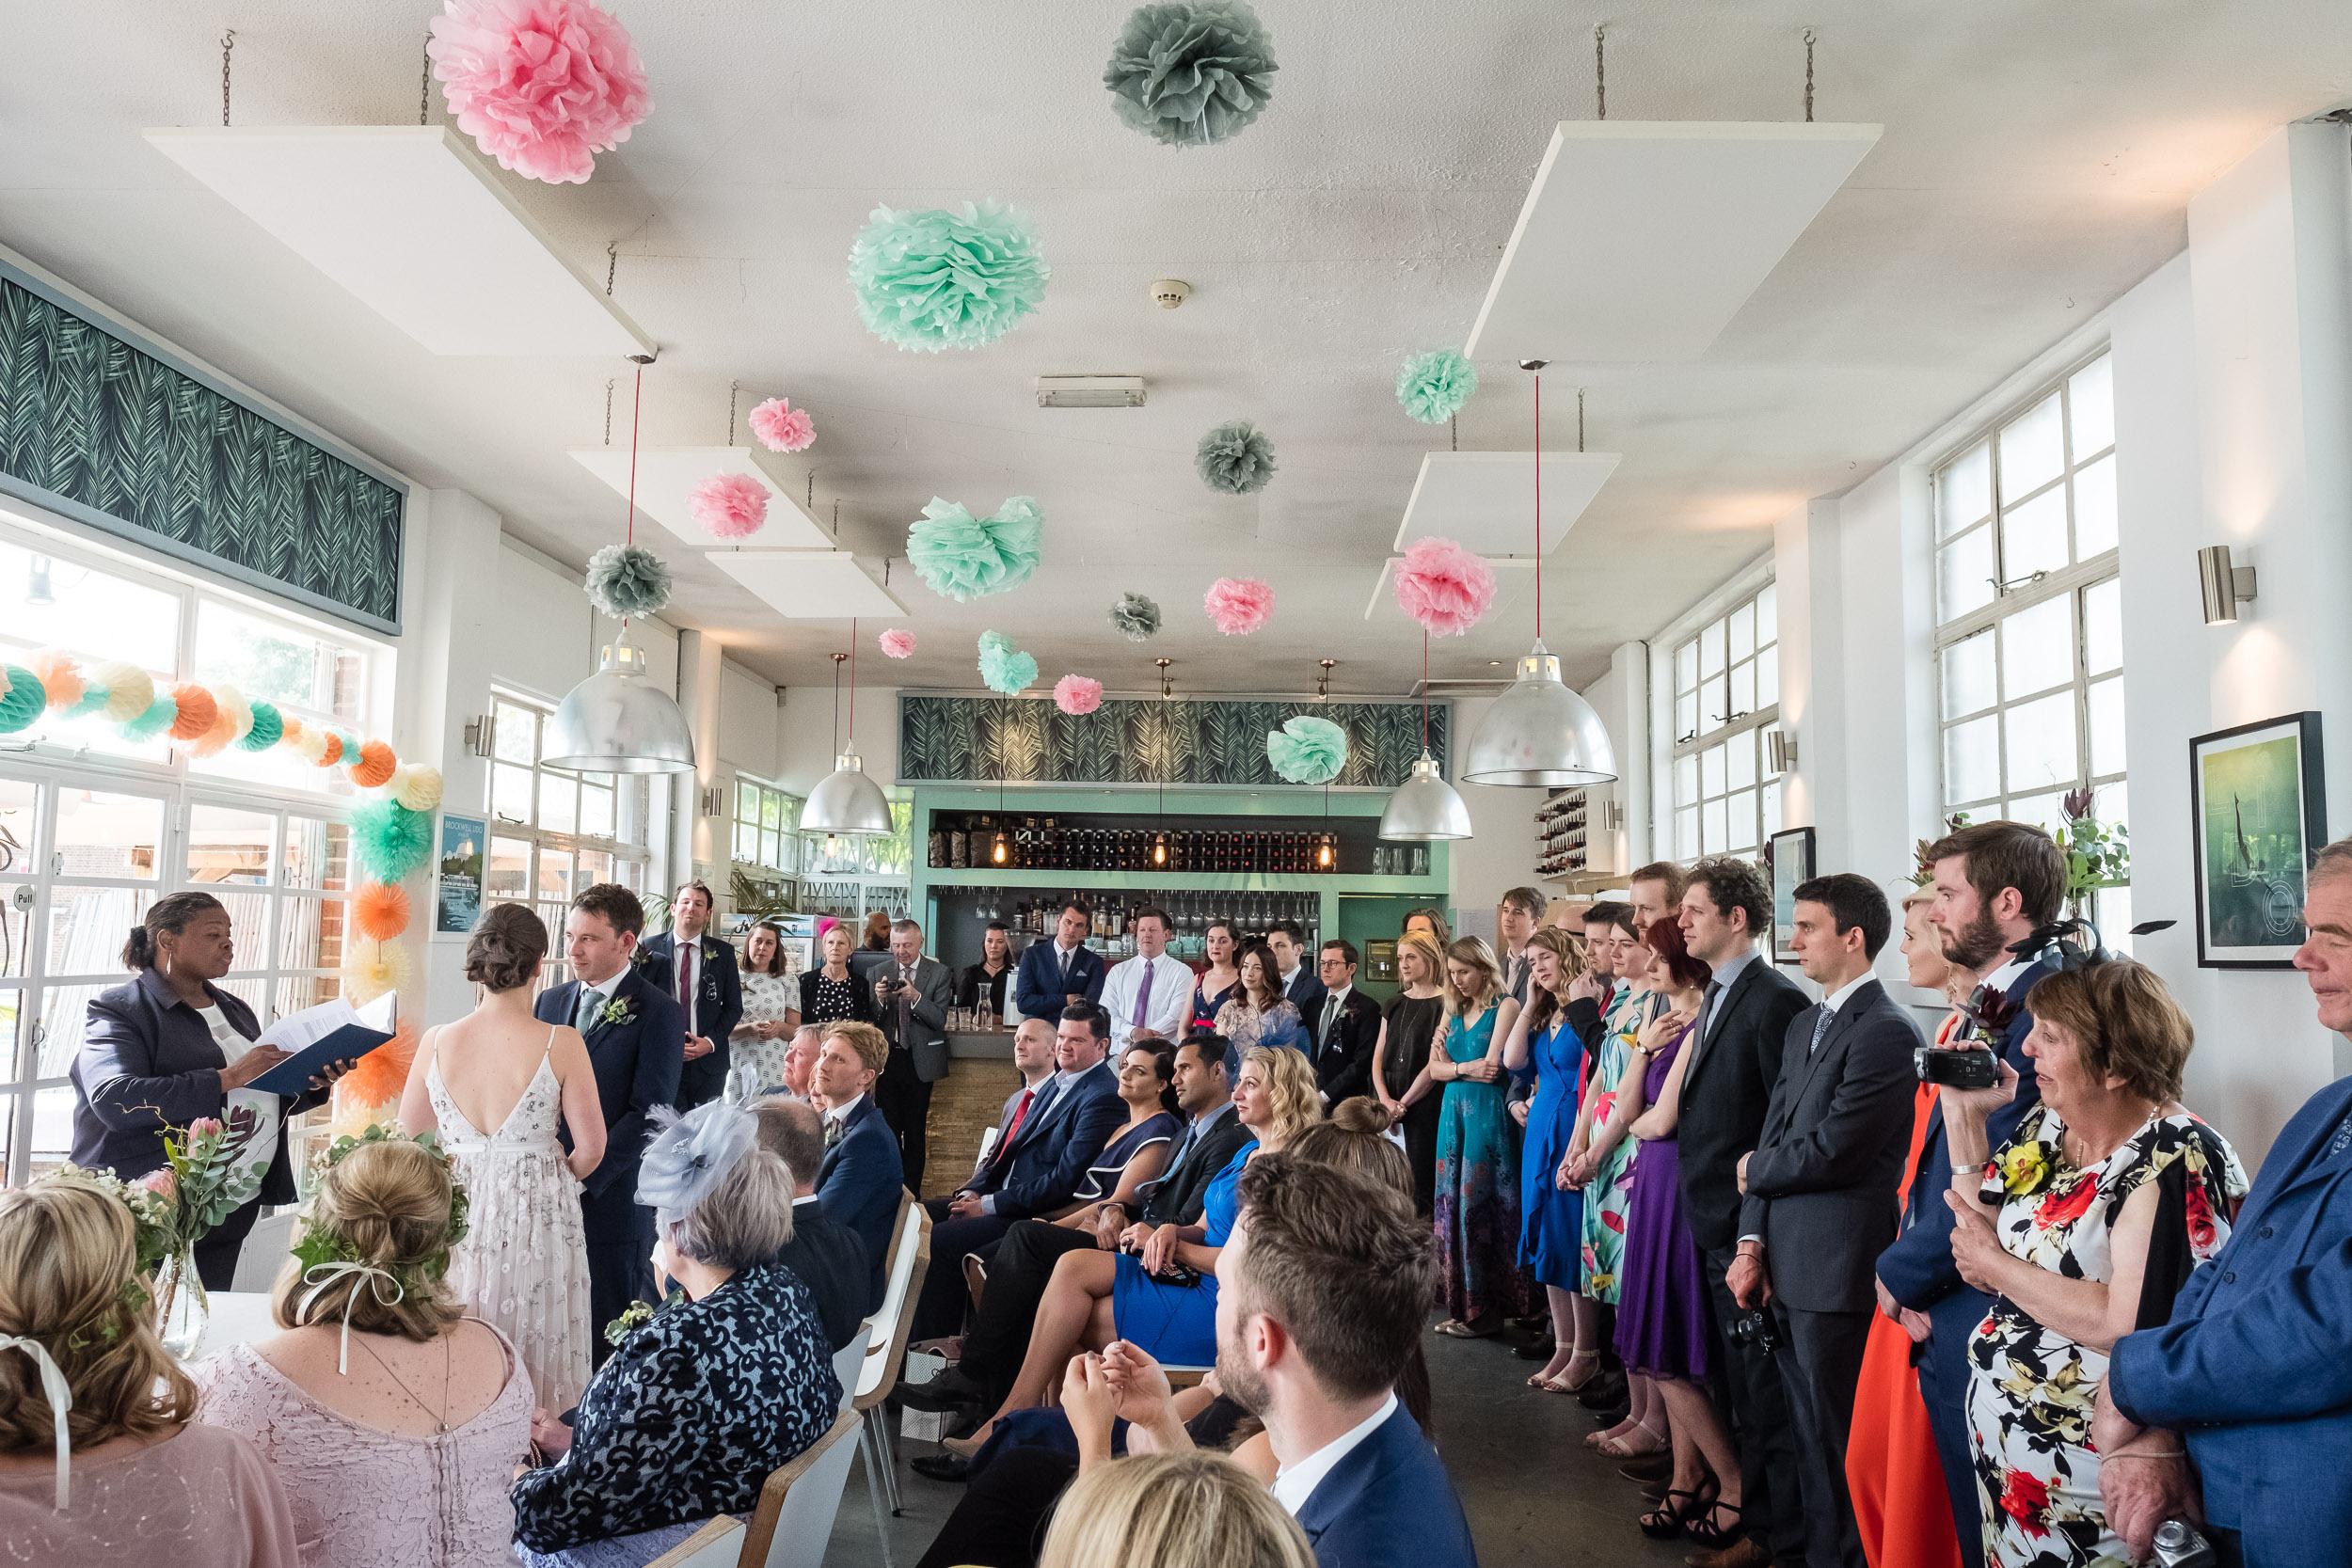 brockwell-lido-brixton-herne-hill-wedding-157.jpg